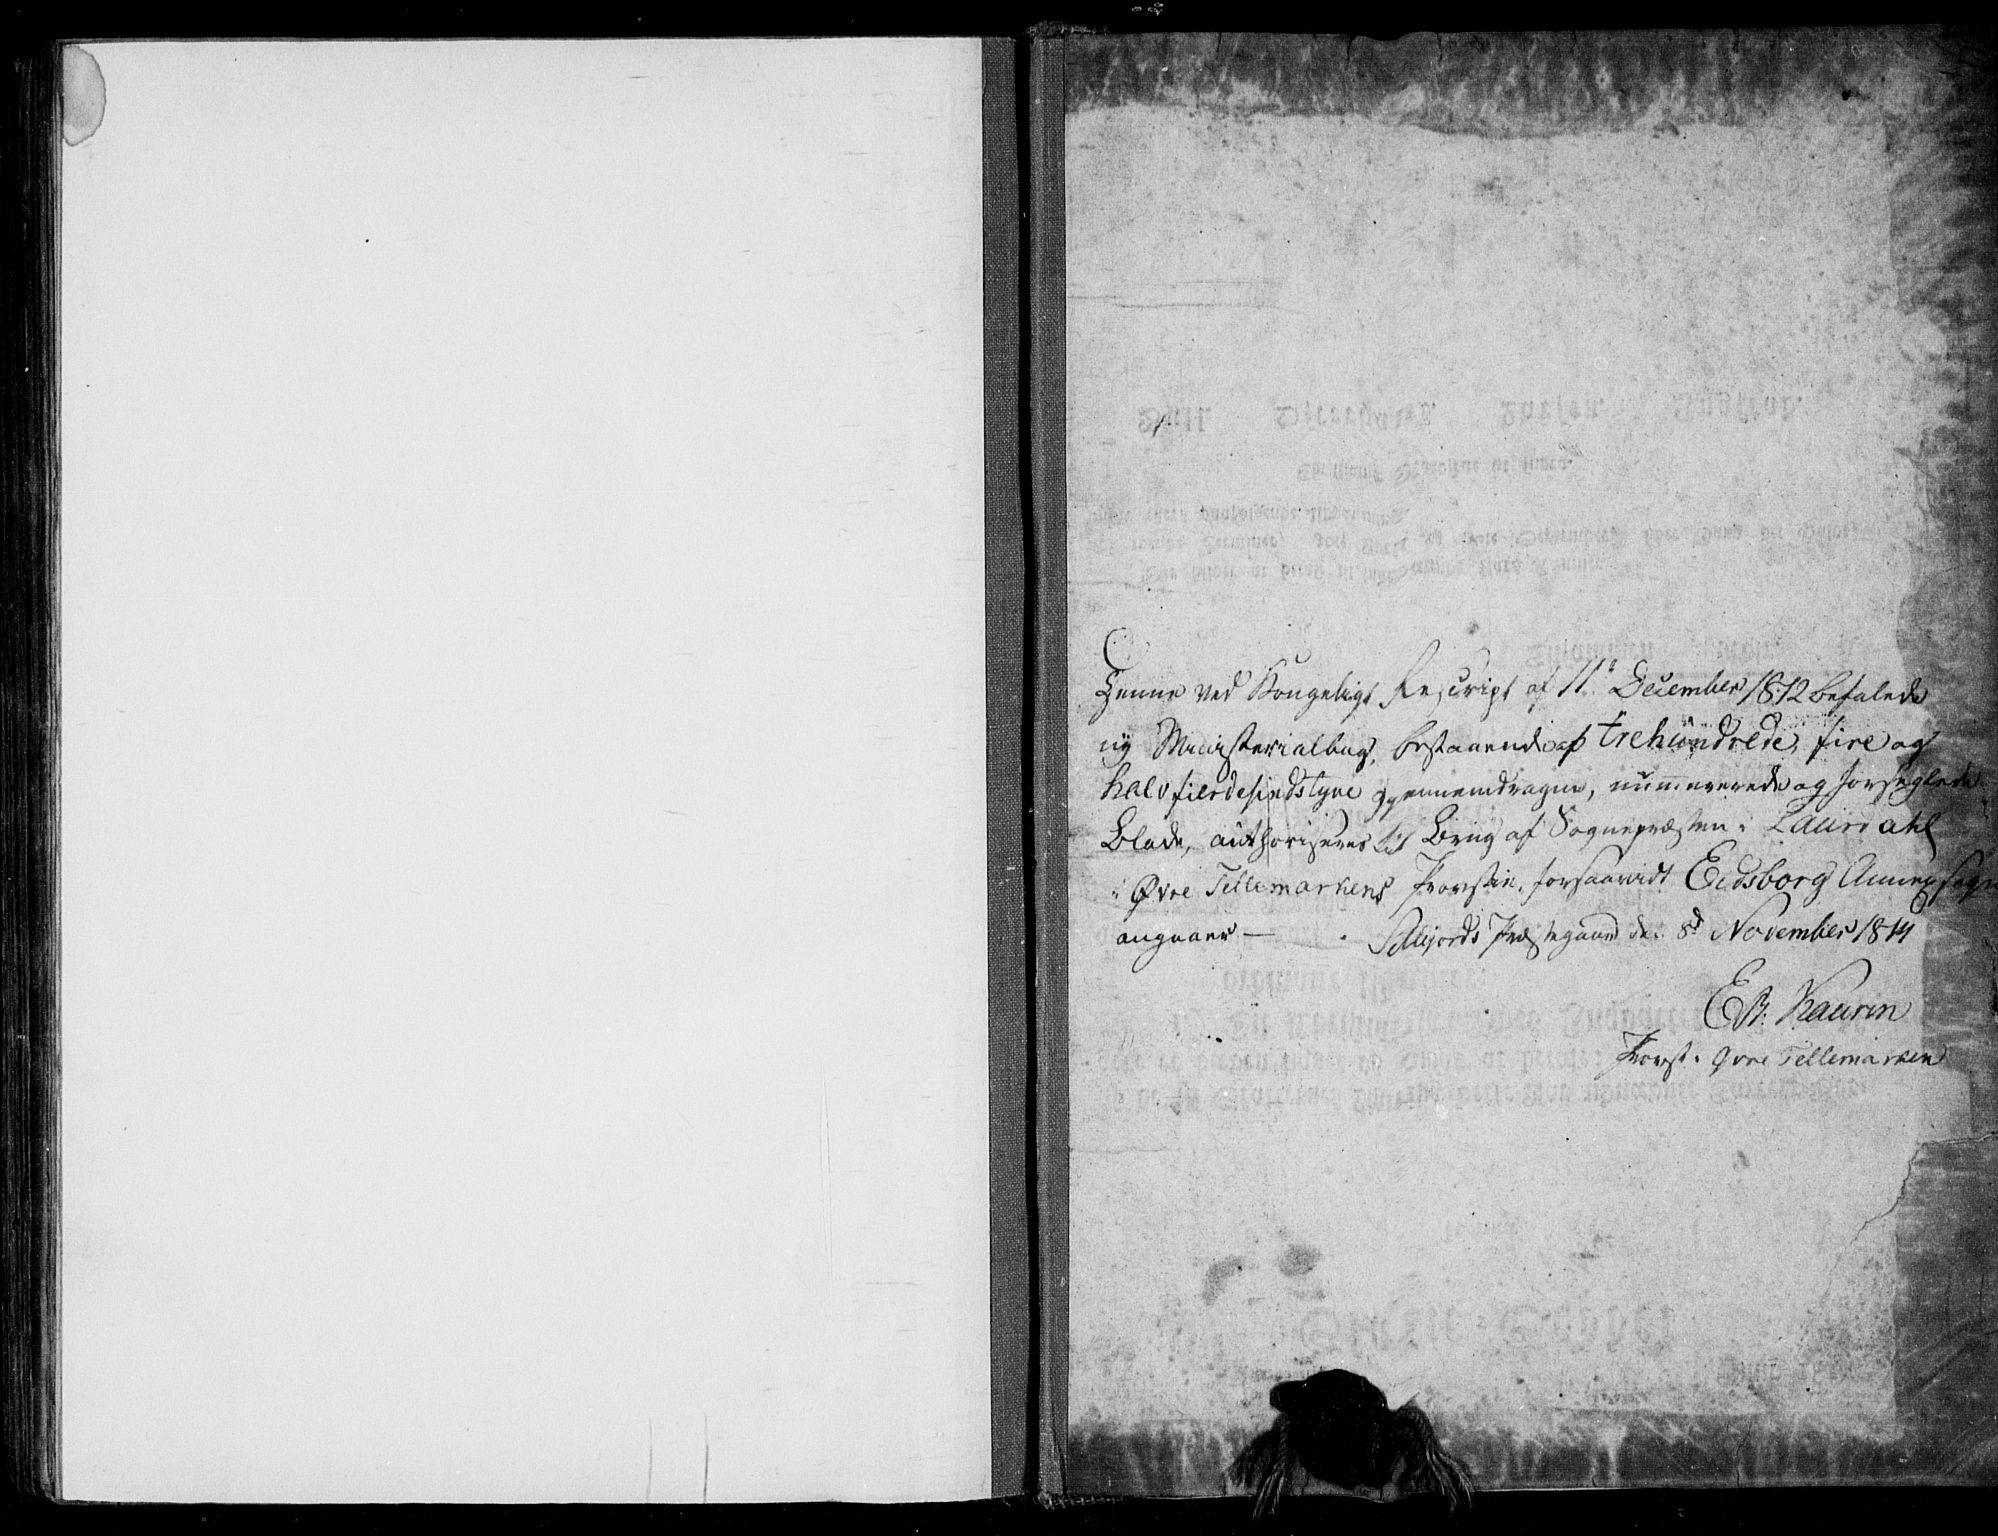 SAKO, Lårdal kirkebøker, F/Fb/L0001: Ministerialbok nr. II 1, 1815-1860